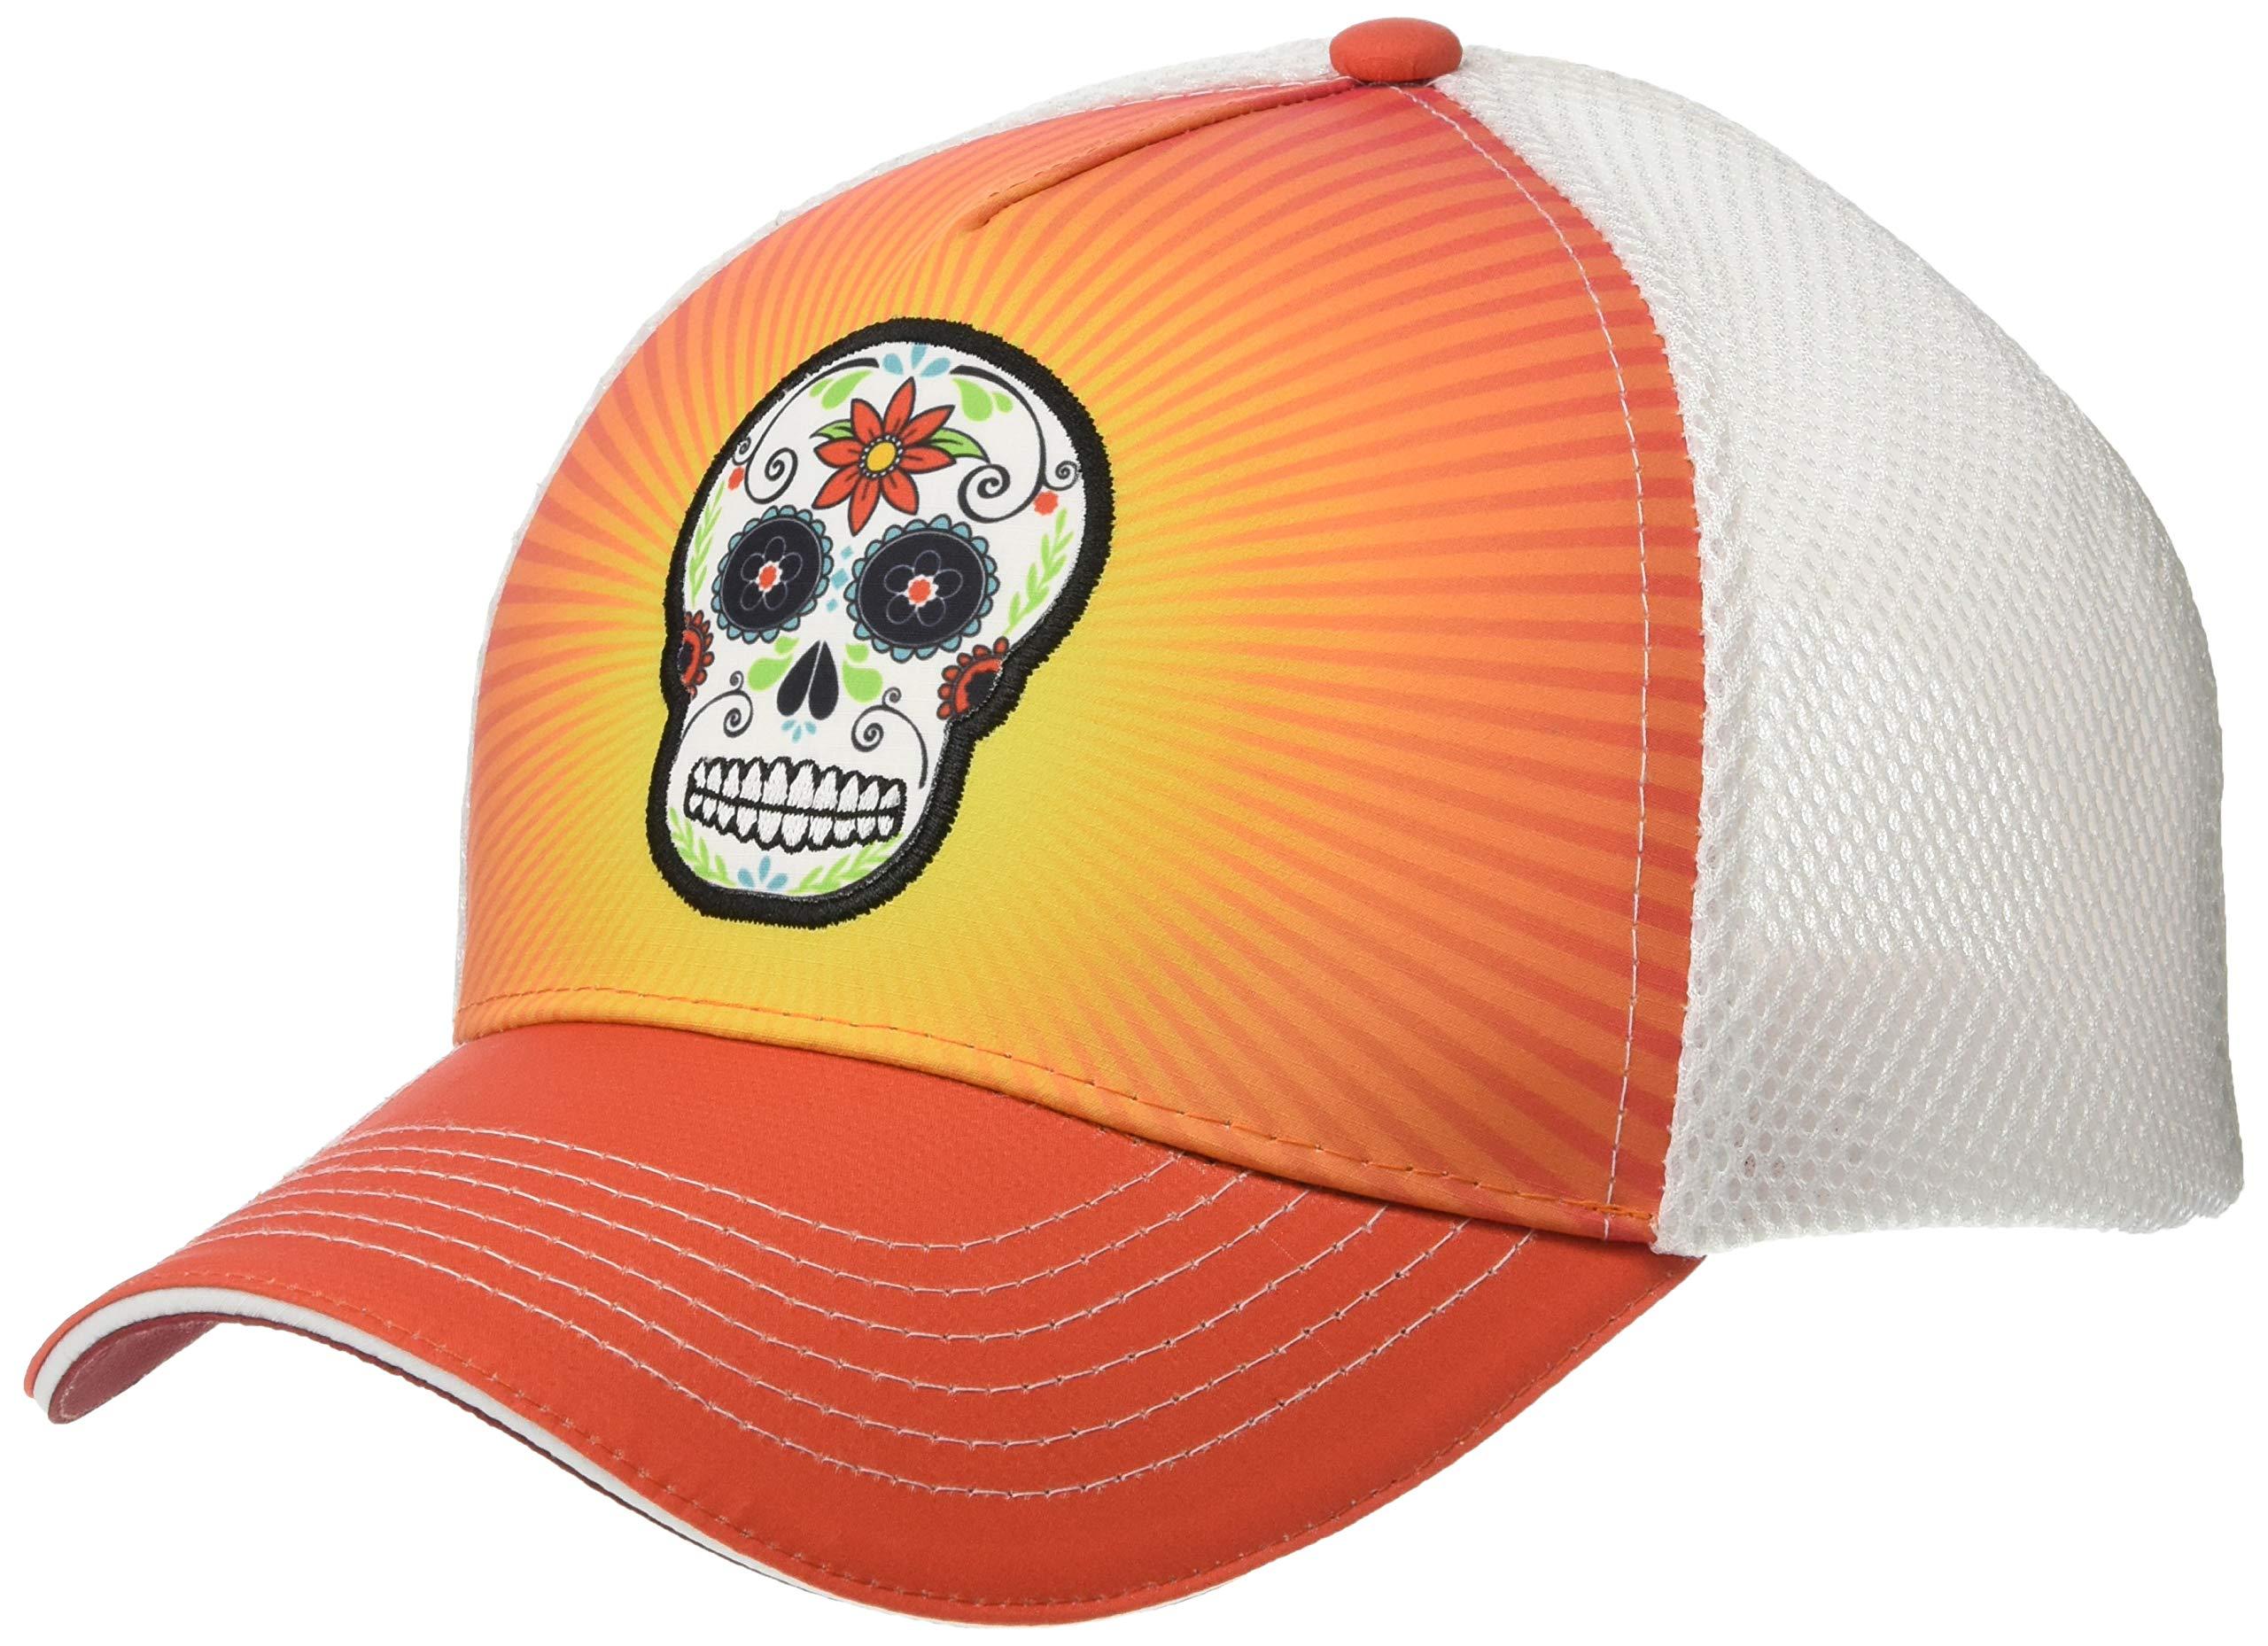 Headsweats Performance Trucker Hat - Sugar Skulls Collection- Buy Online in  Mongolia at mongolia.desertcart.com. ProductId : 161774427.